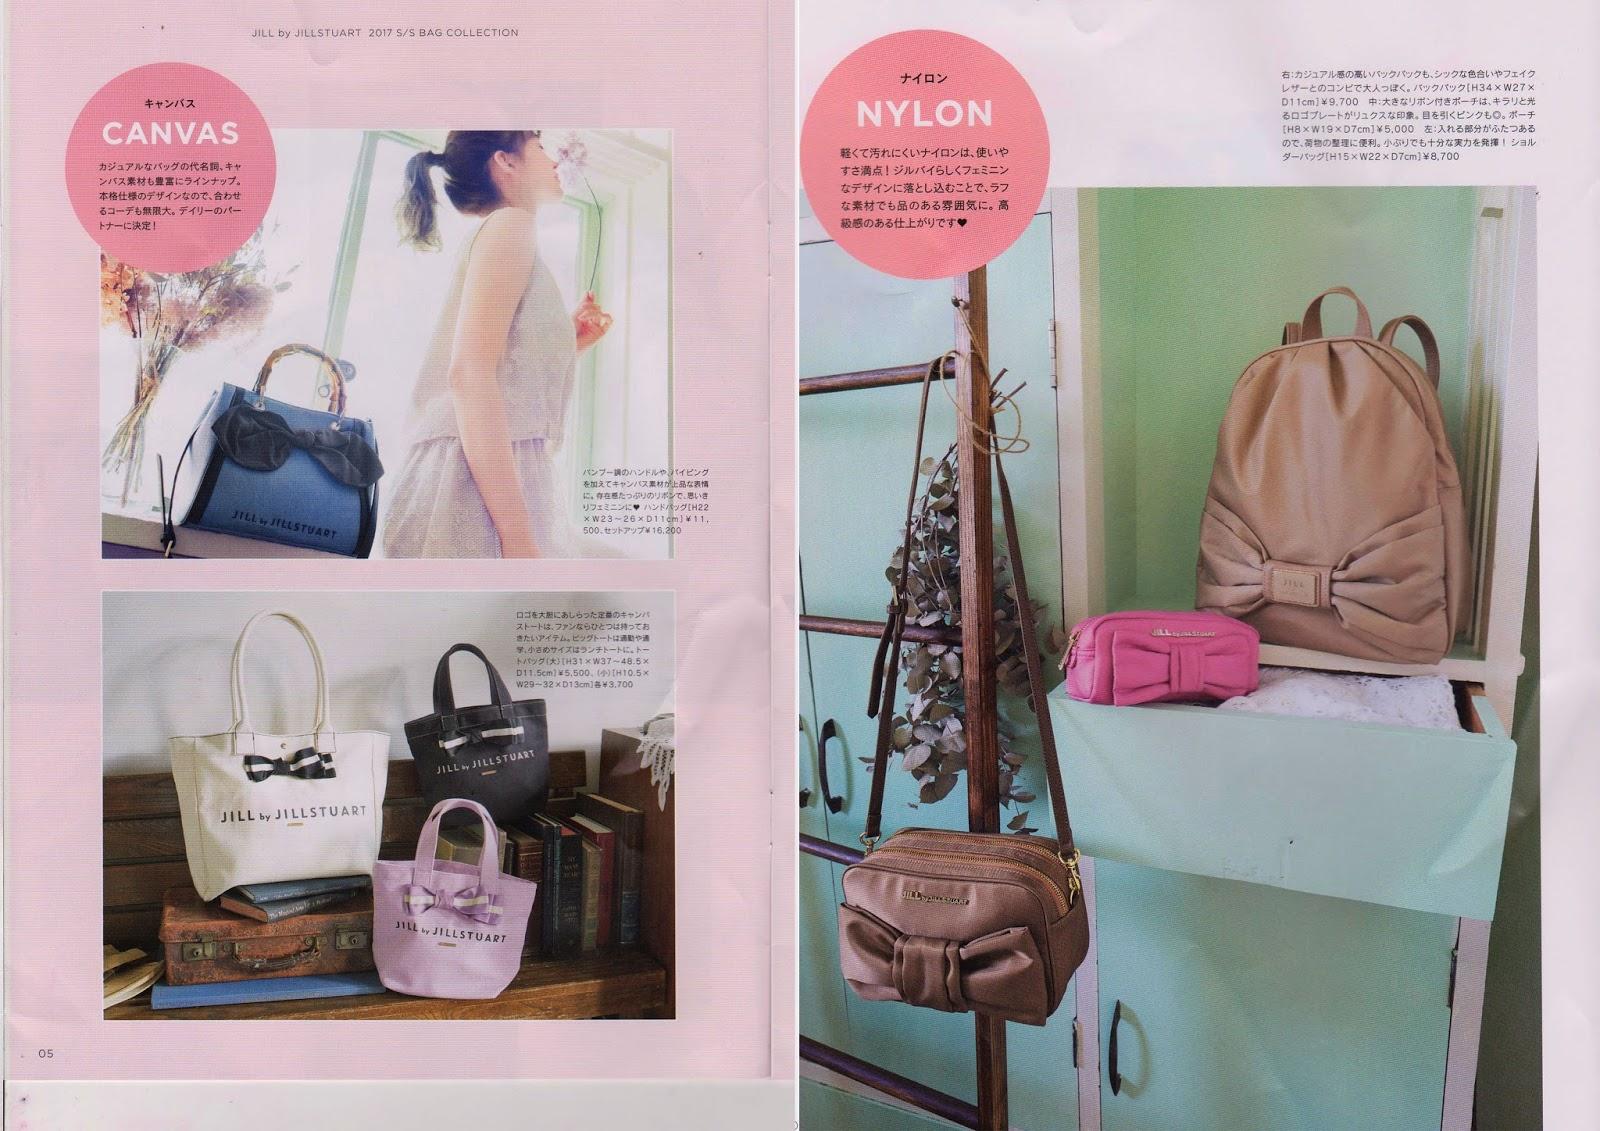 jill stuart spring summer bag collection